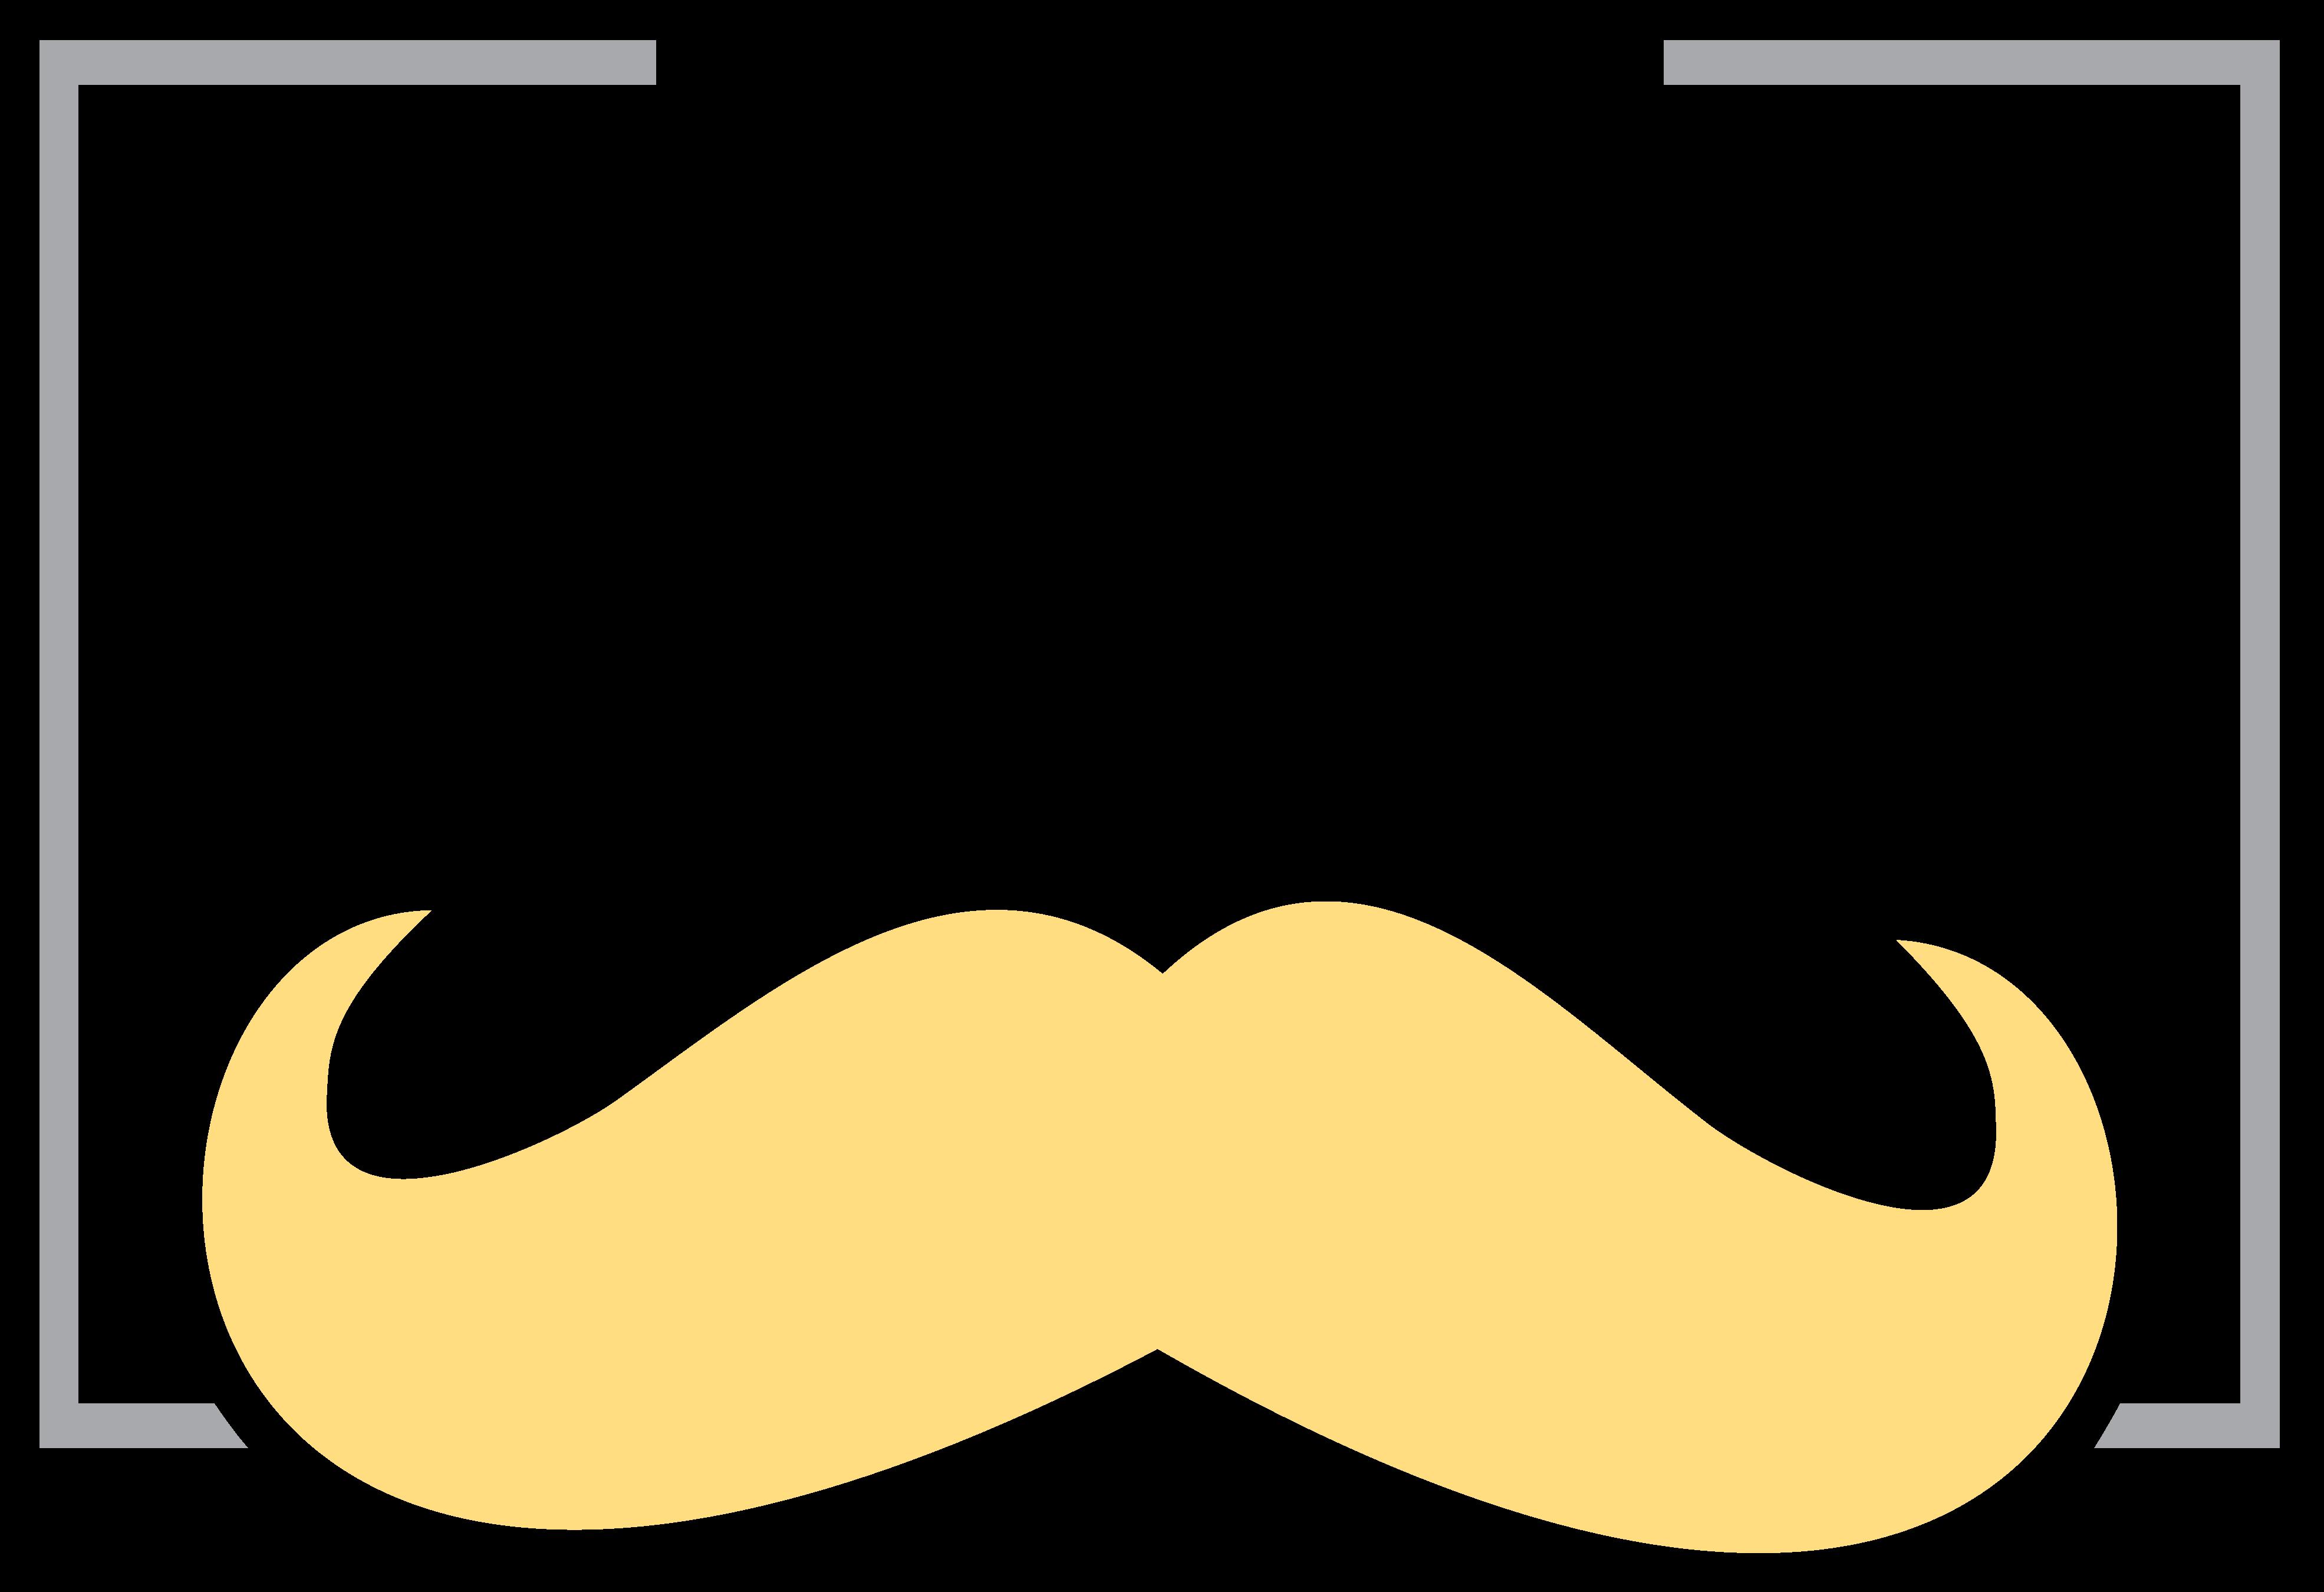 Clipart mustache fathers day. Personalized father mug unique